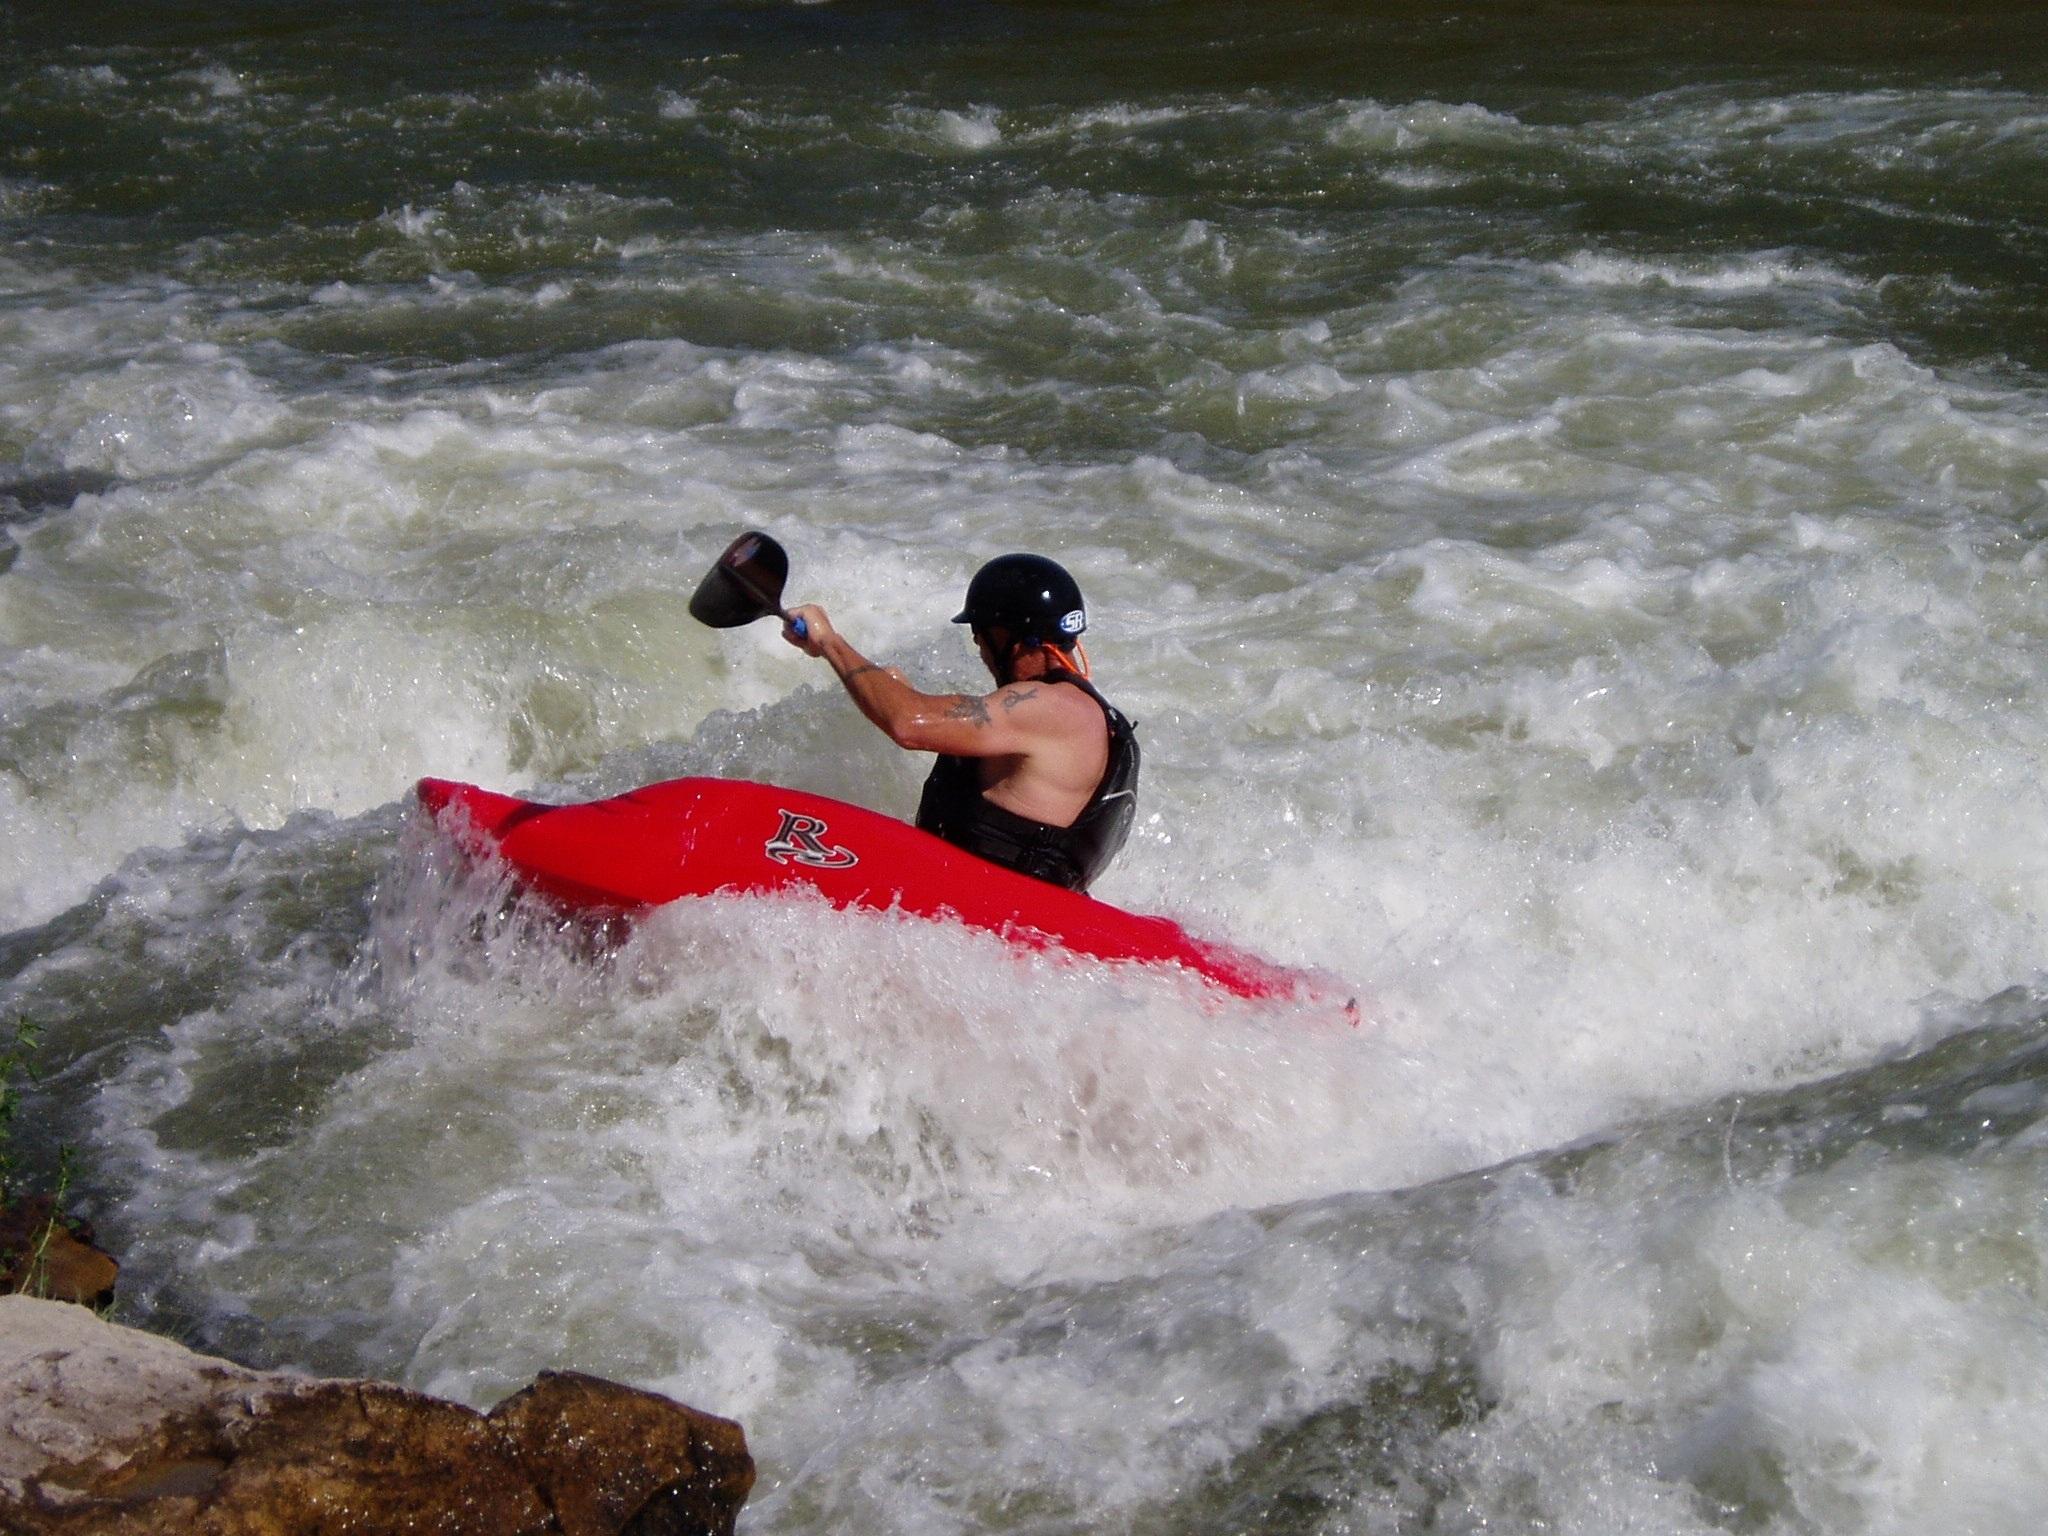 Landscape Sea Water Wilderness Sport Boat Wave River Canoe Paddle Vehicle Rapid Float Extreme Kayak